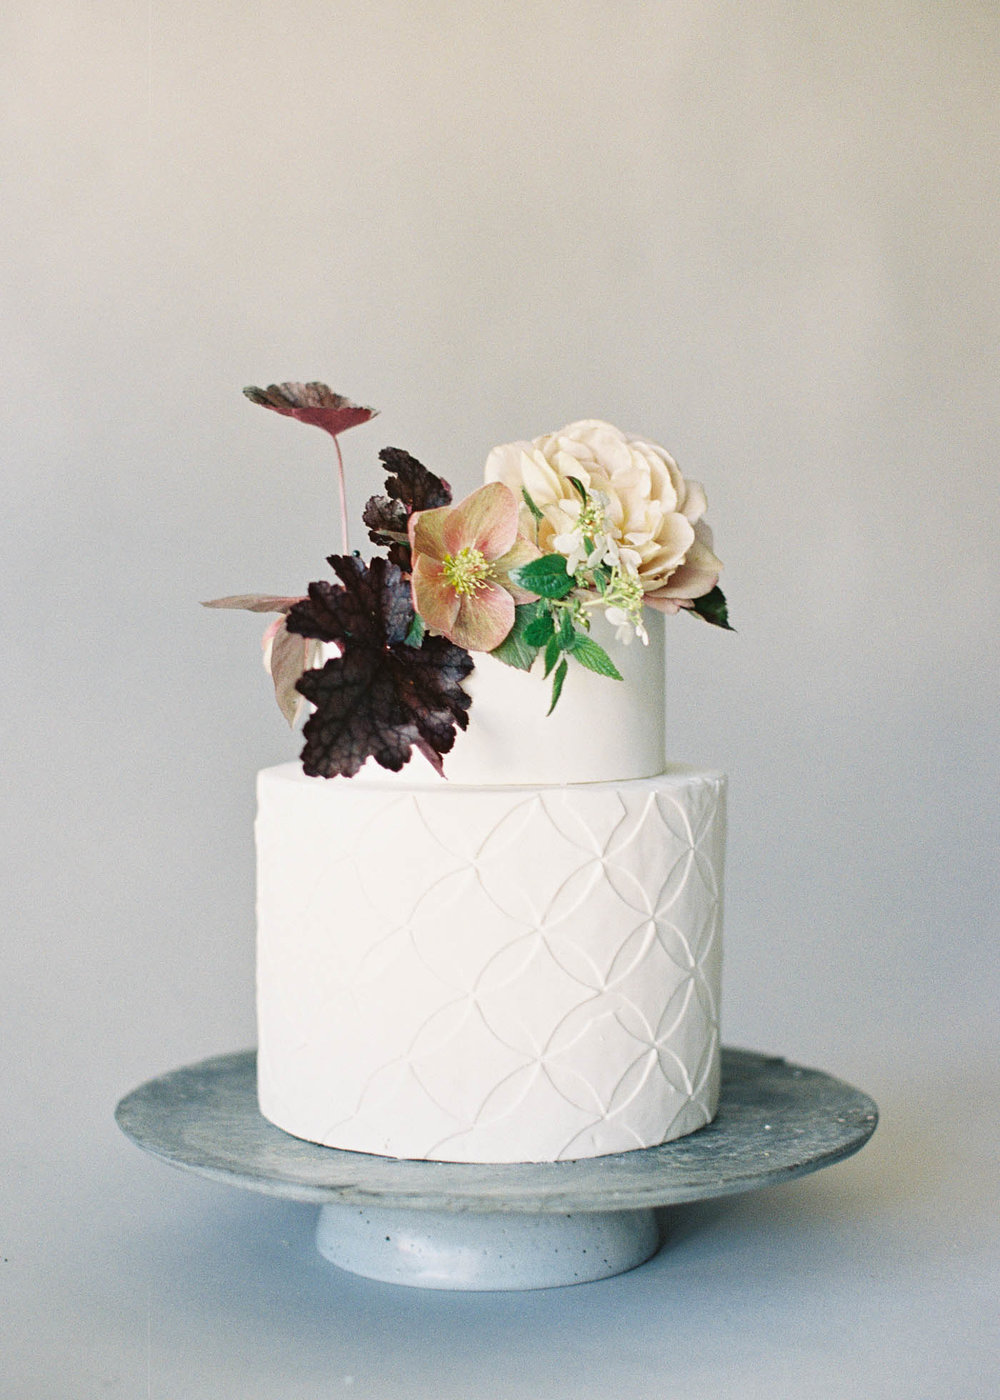 naturalist-cakes-13-Jen_Huang-000486-R1-059-28.jpg